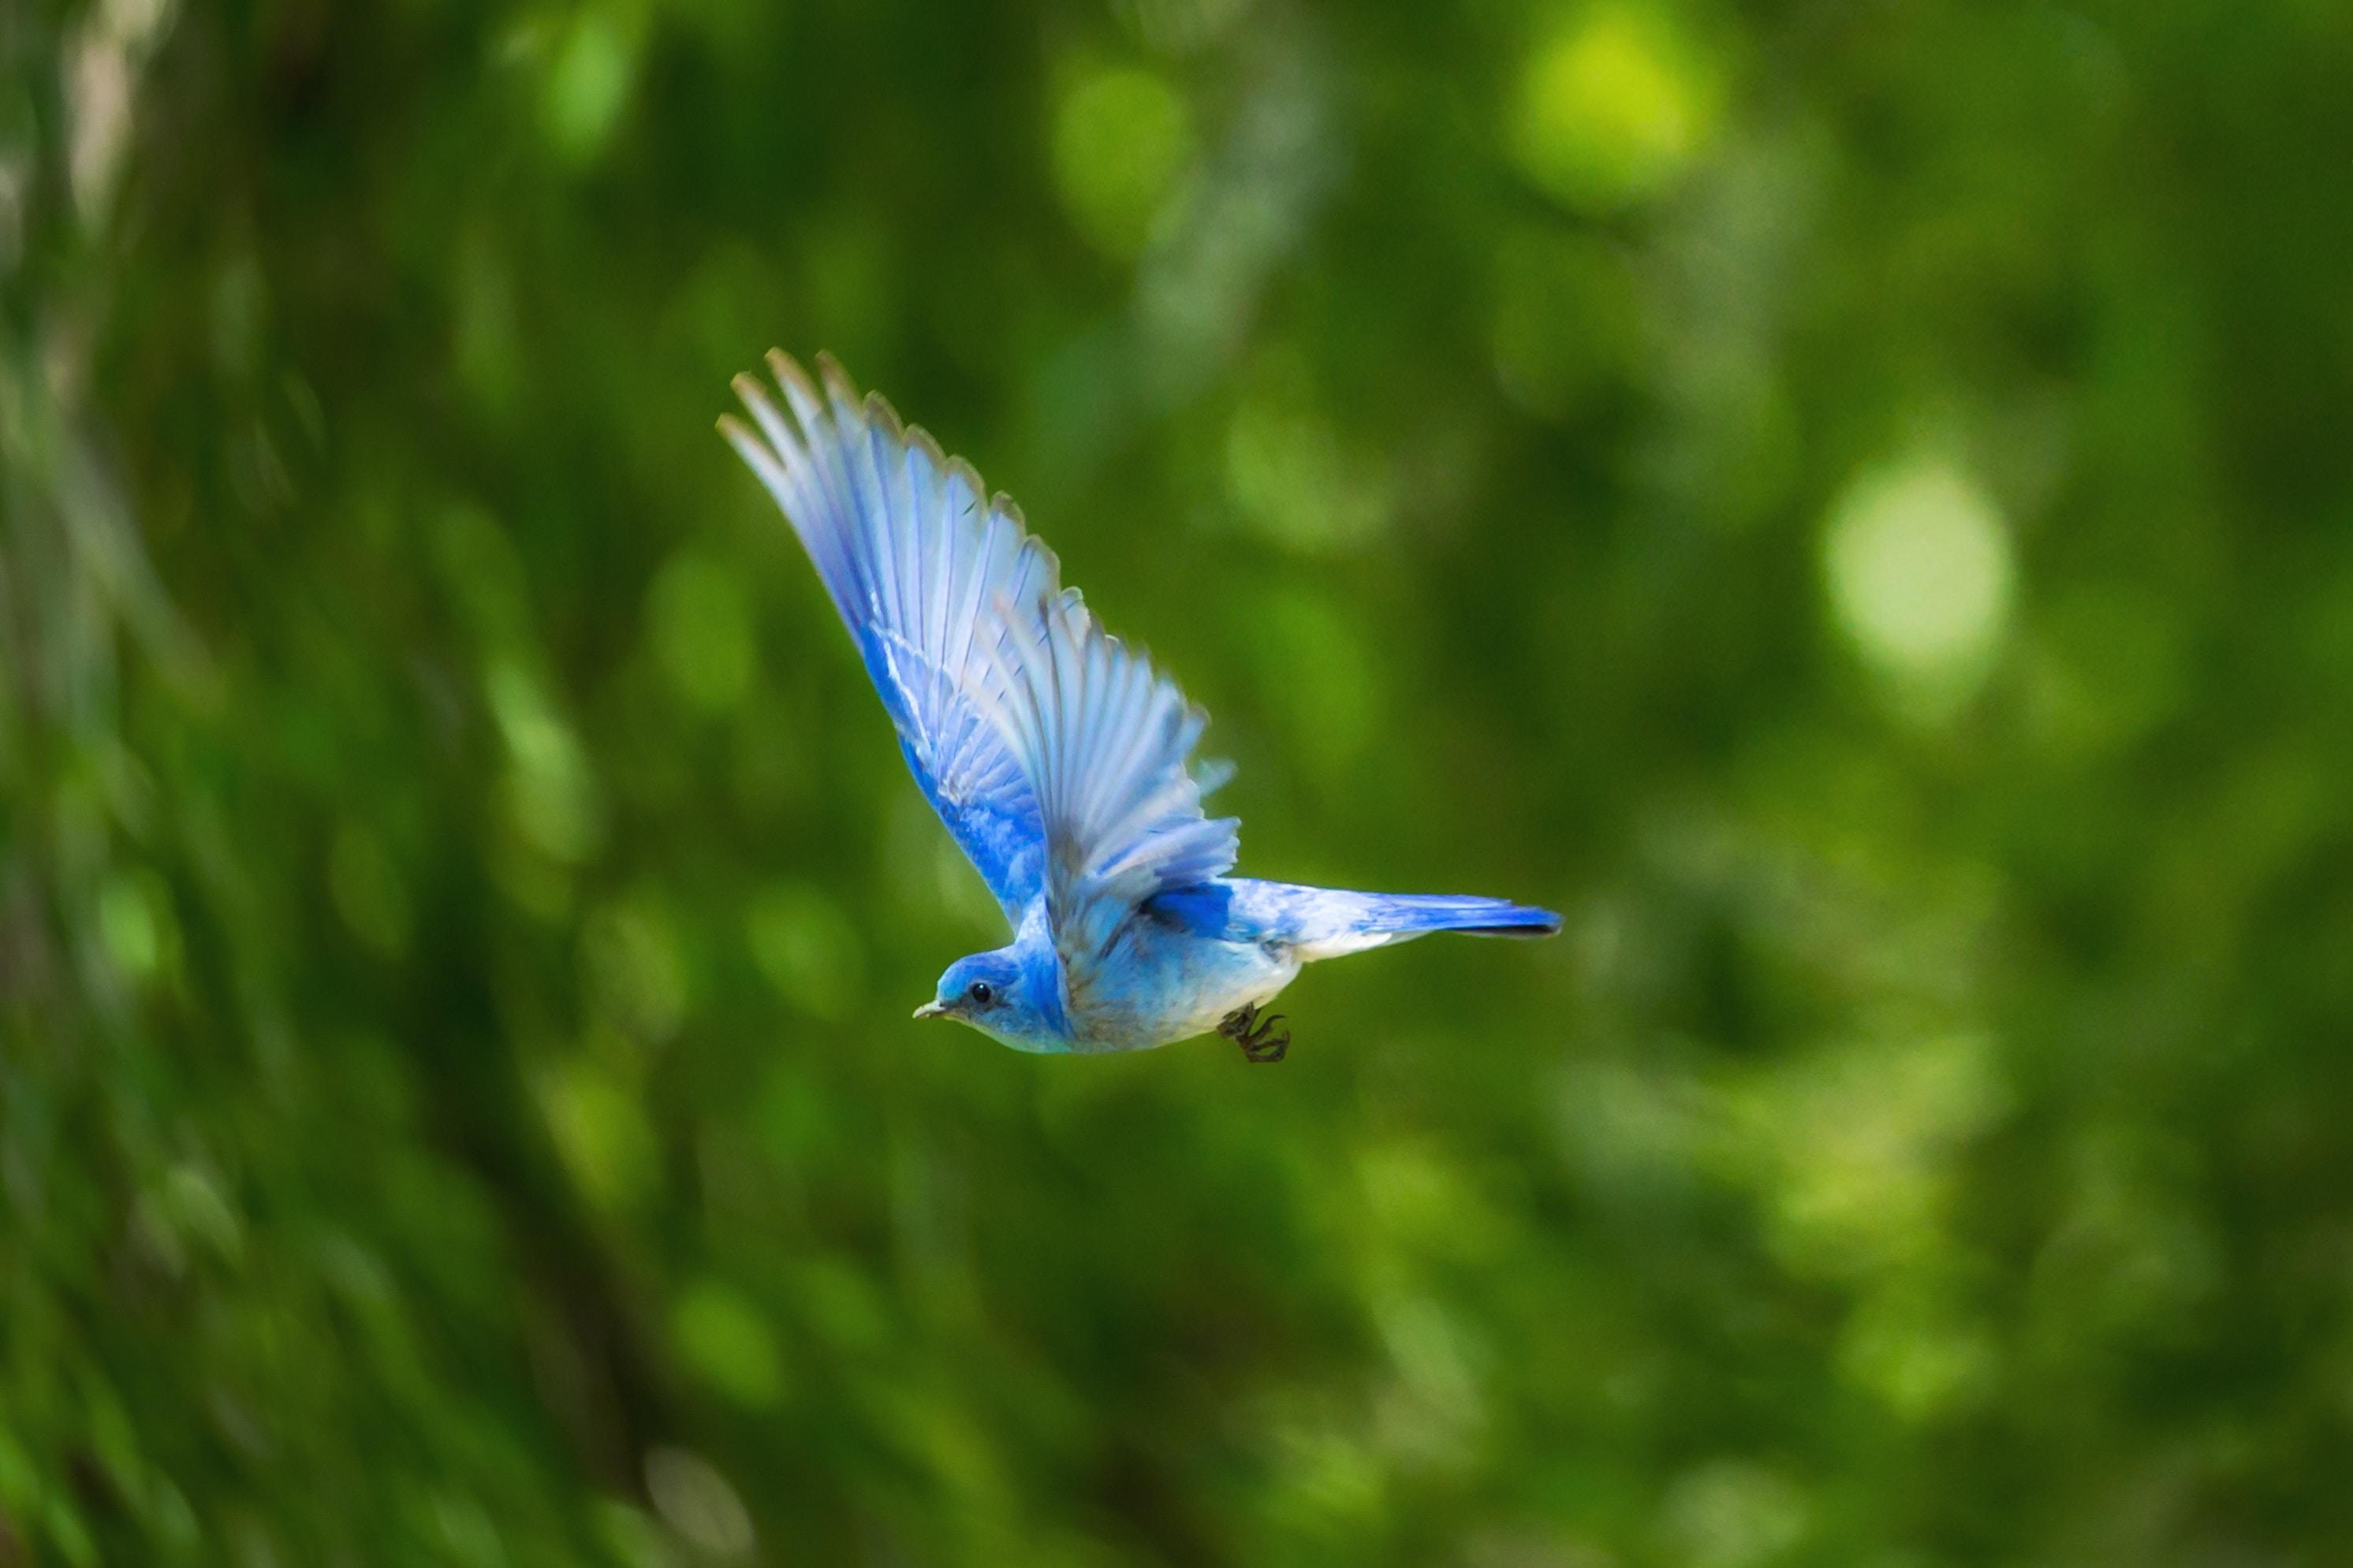 flying blue humming bird